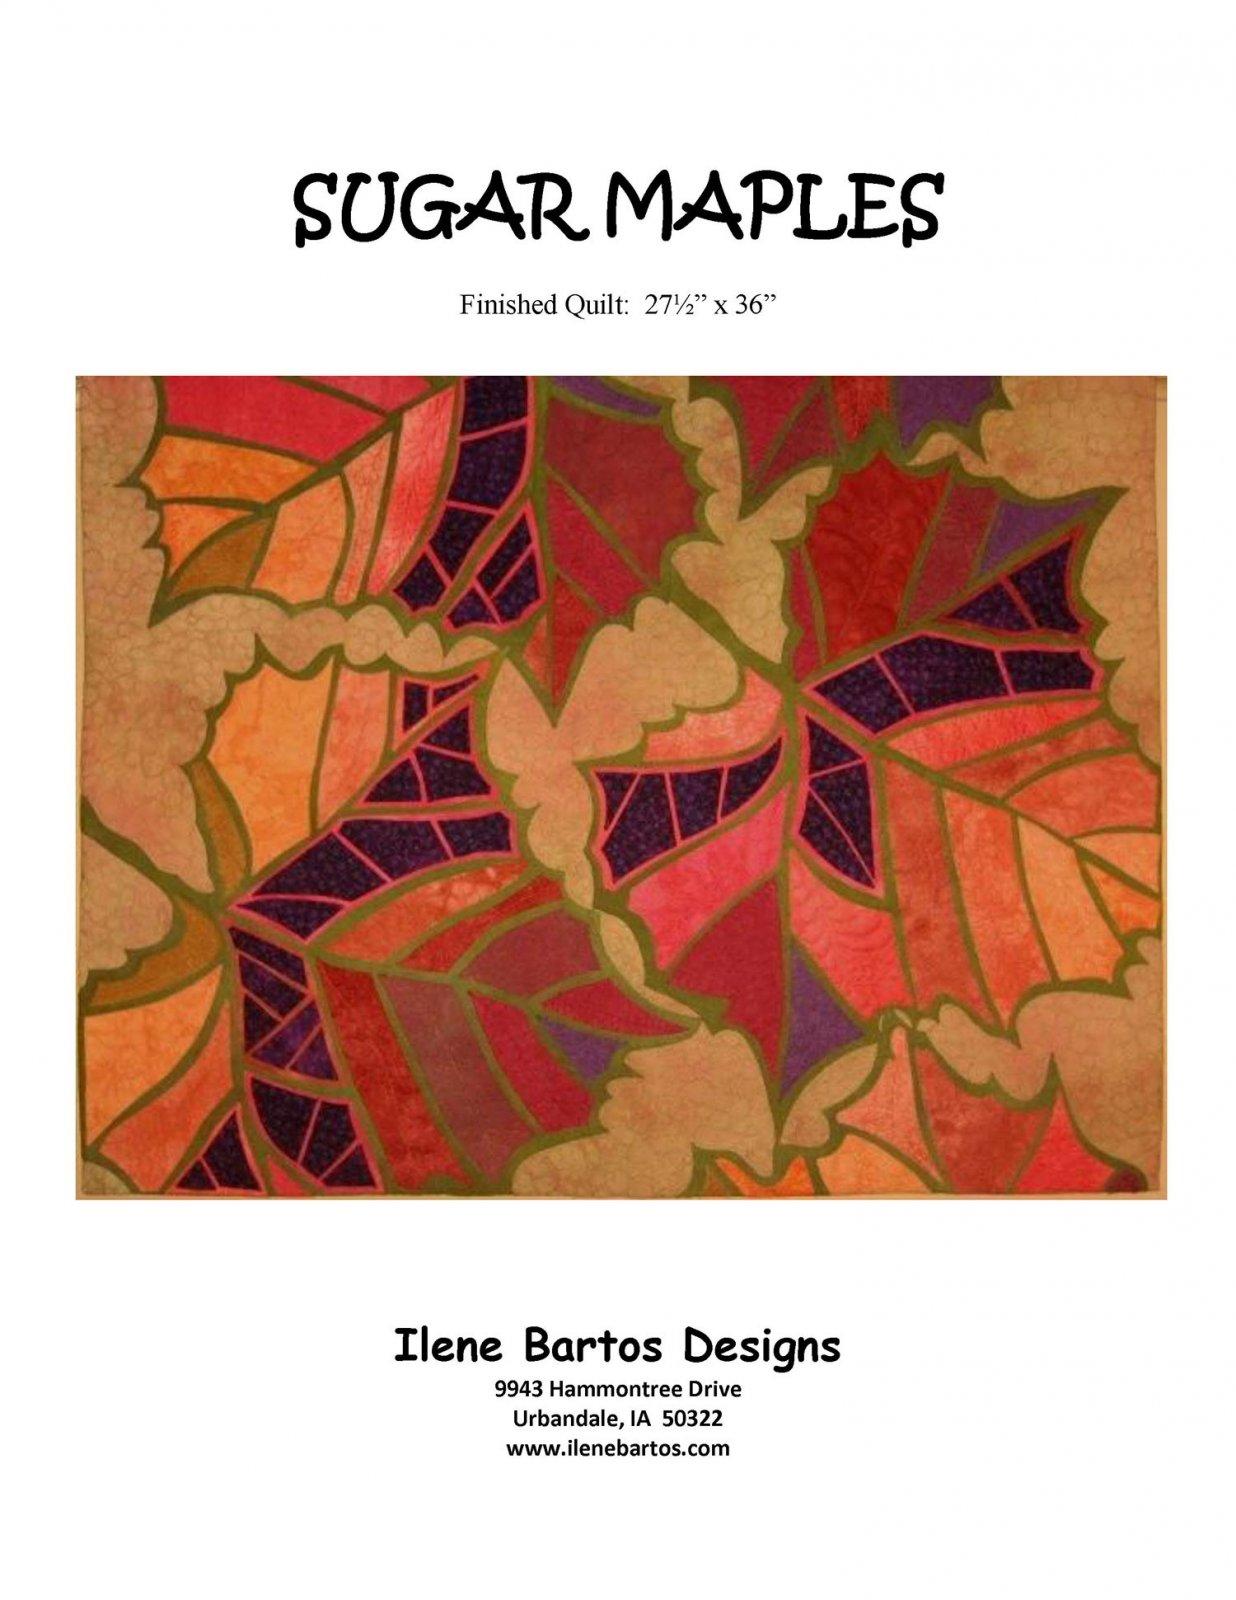 Sugar Maples